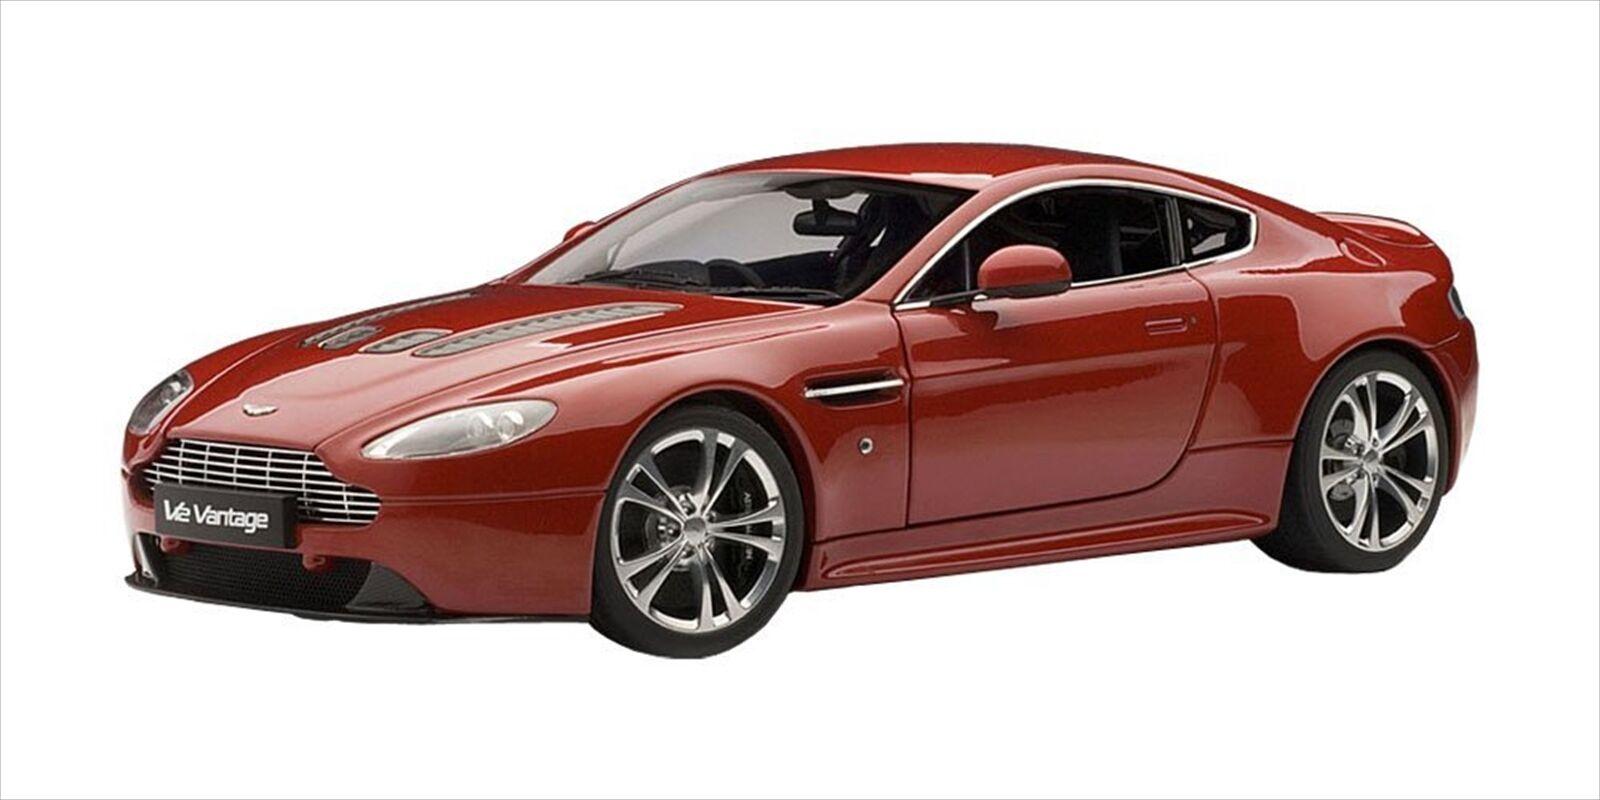 AUTOart 1 18 Aston Martin V12 Vantage 2010 rot Diecast Model 70208